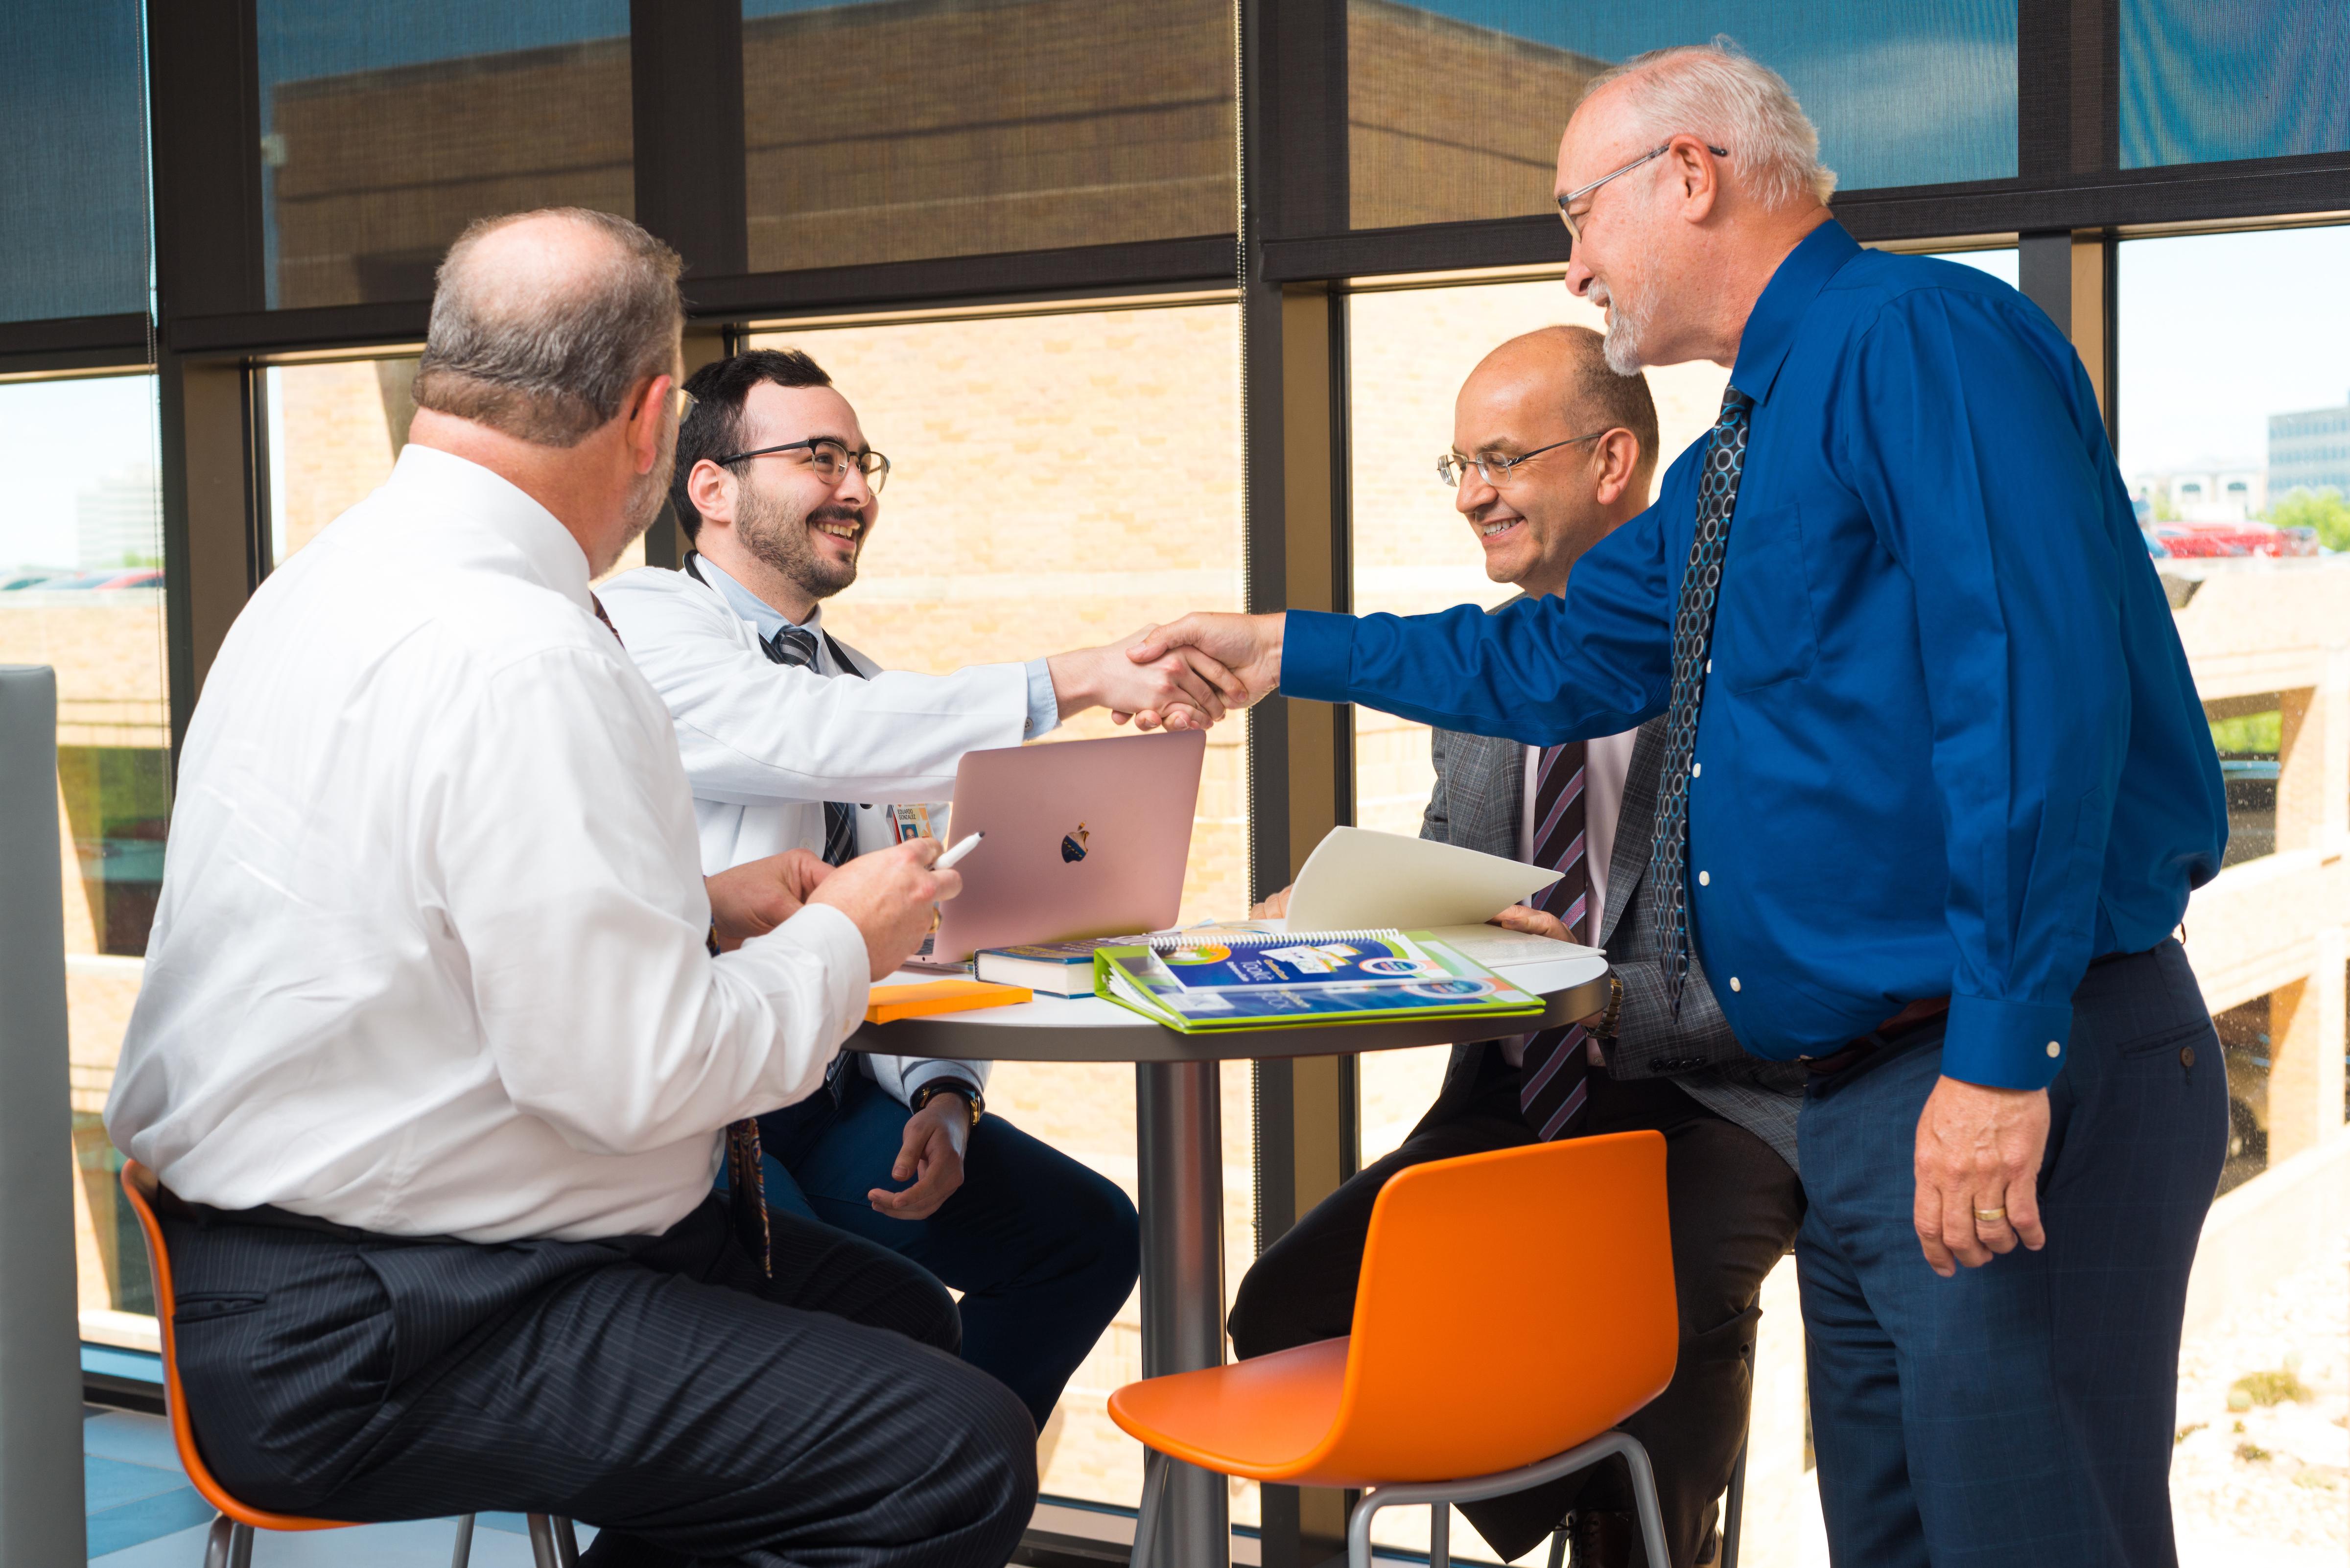 UT Health San Antonio launched Tech Novum, a new accelerator for its faculty. From left: Sean Thompson, Eduardo Gonzalez, Andrea Guiffrida, and John Fritz. Photo courtesy UT Health San Antonio.